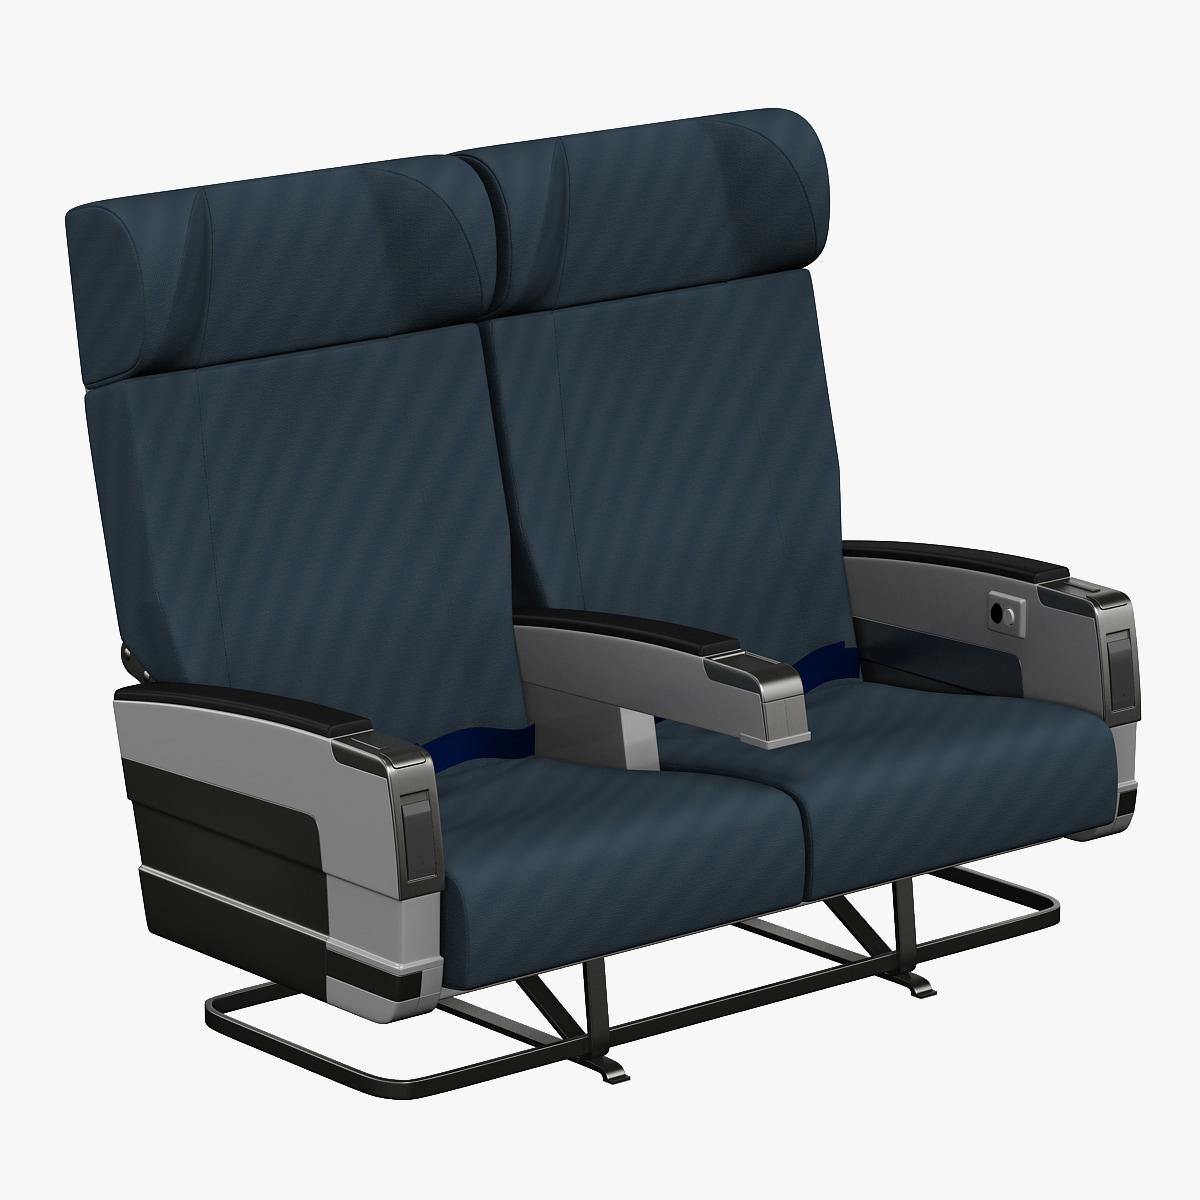 Aircraft_Passenger_Seats_v3_000.jpg